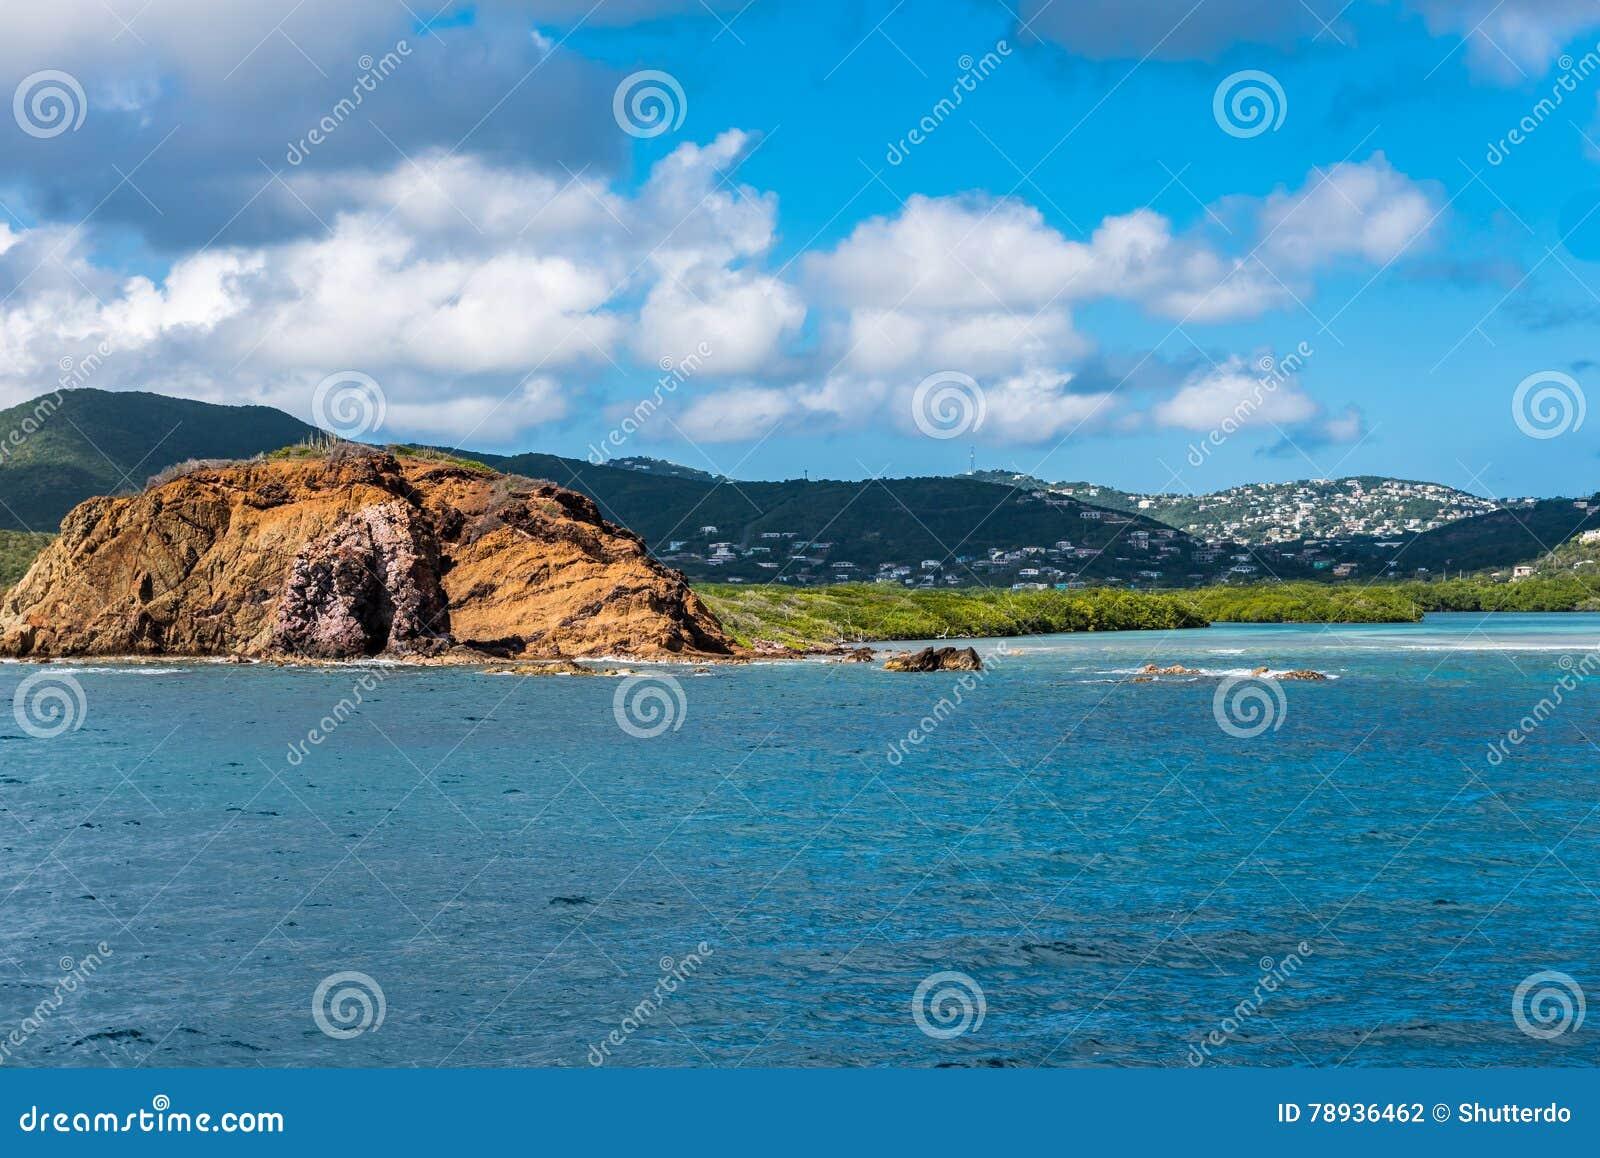 rocky coastline of st thomas island stock photo image of